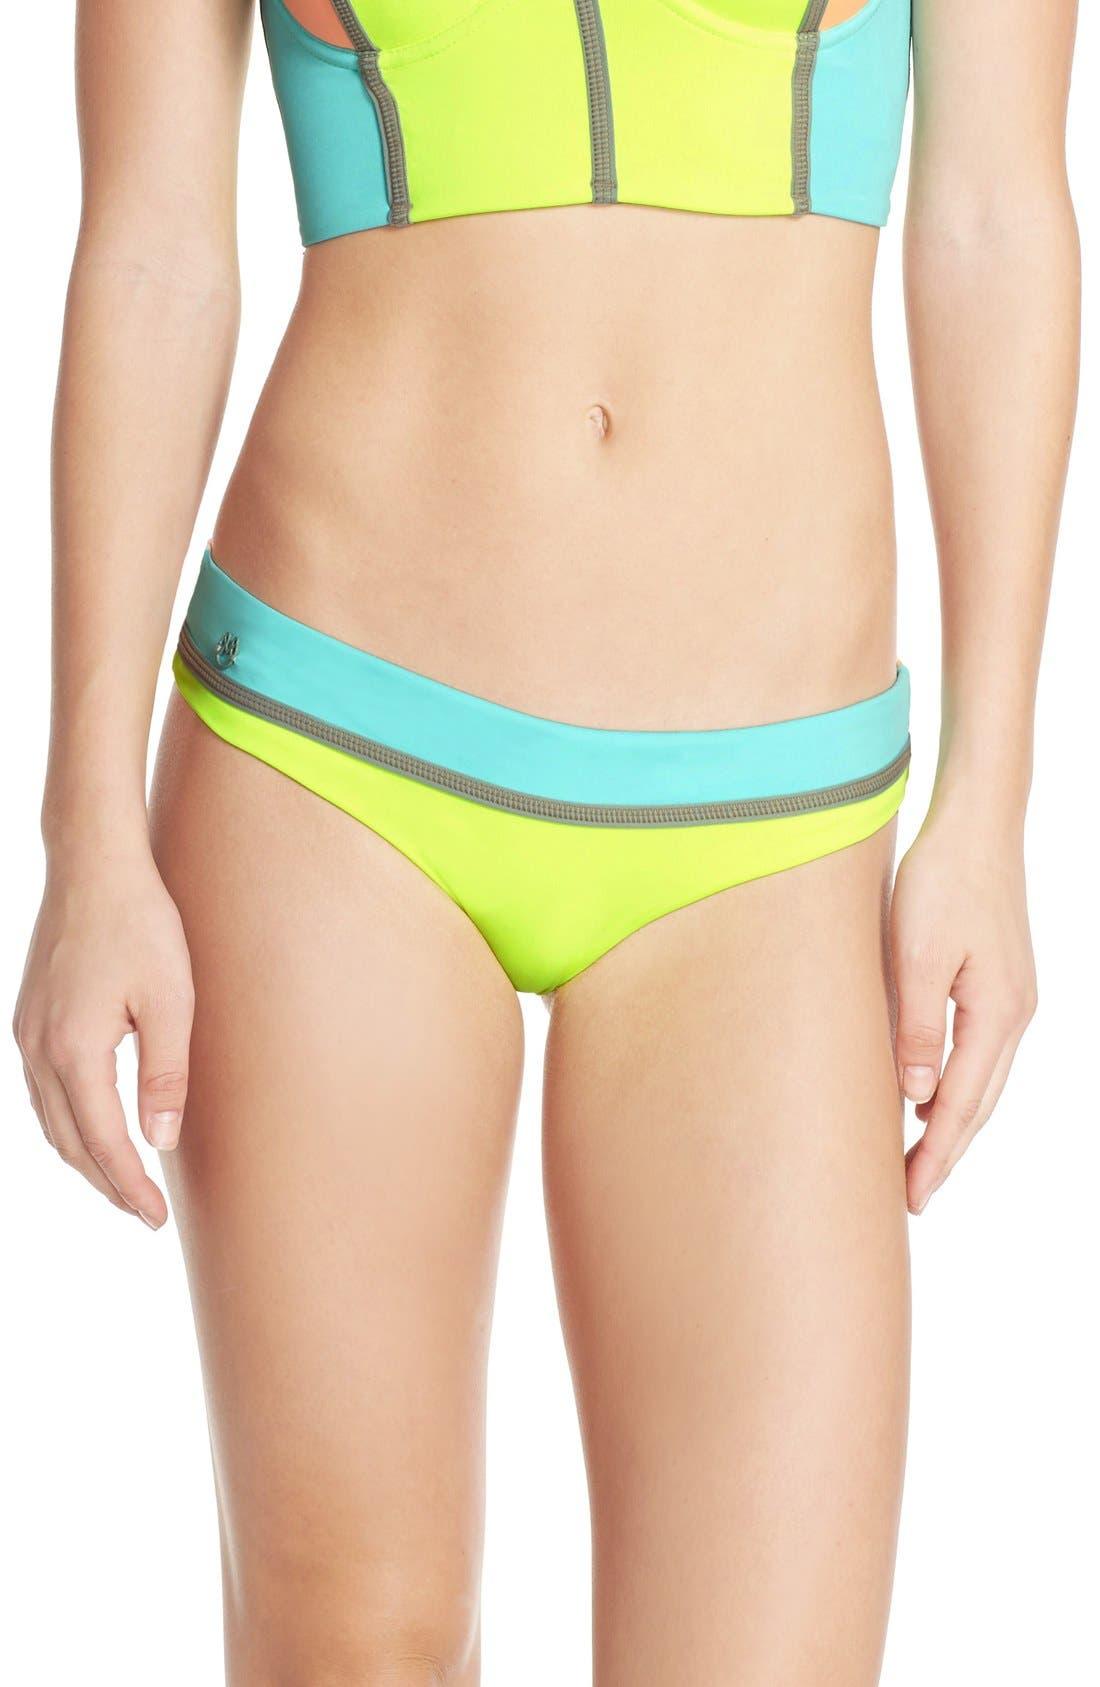 Alternate Image 2  - Maaji 'Lime Cubism' Reversible Bikini Bottoms